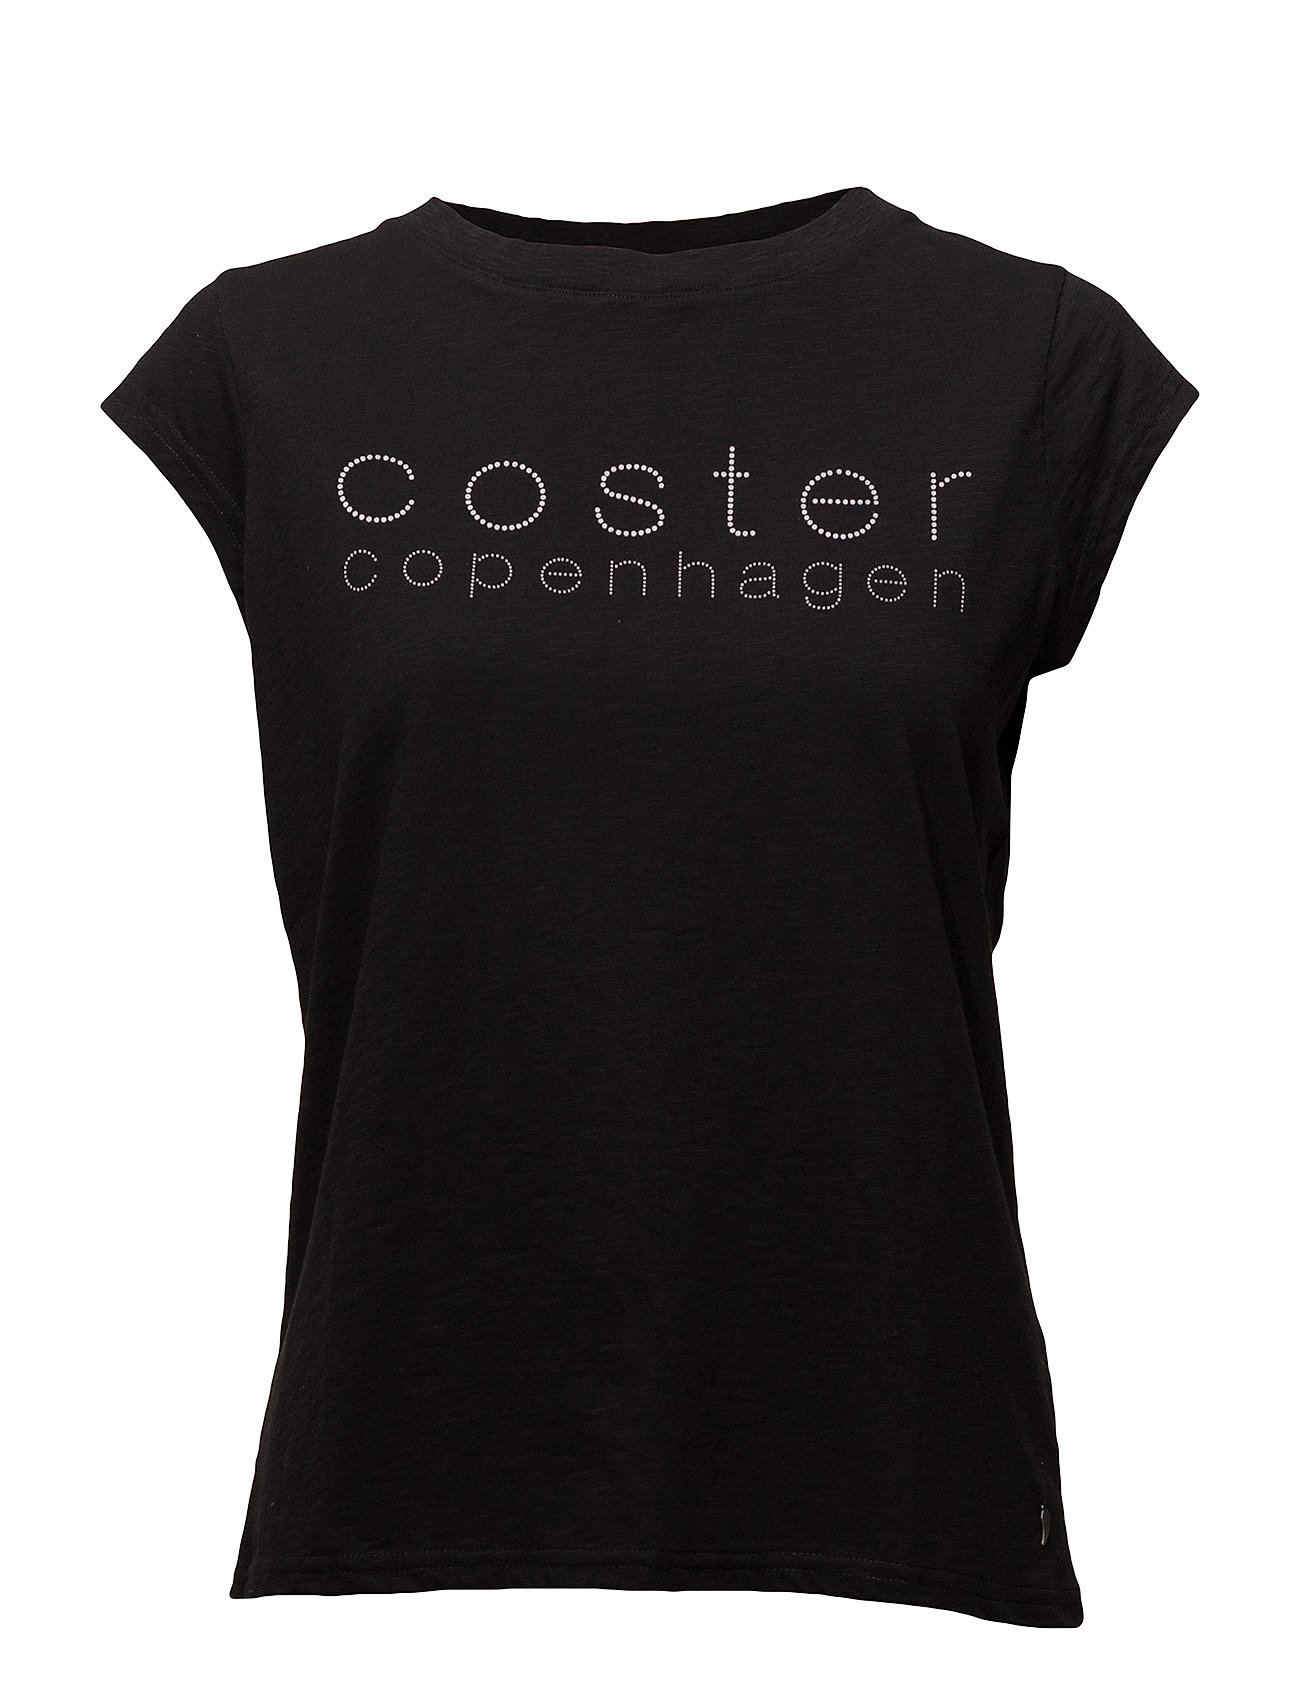 shirt shirt WCoster shirt WCoster T T T T WCoster LogoblackCopenhagen LogoblackCopenhagen shirt LogoblackCopenhagen uF315lcTKJ